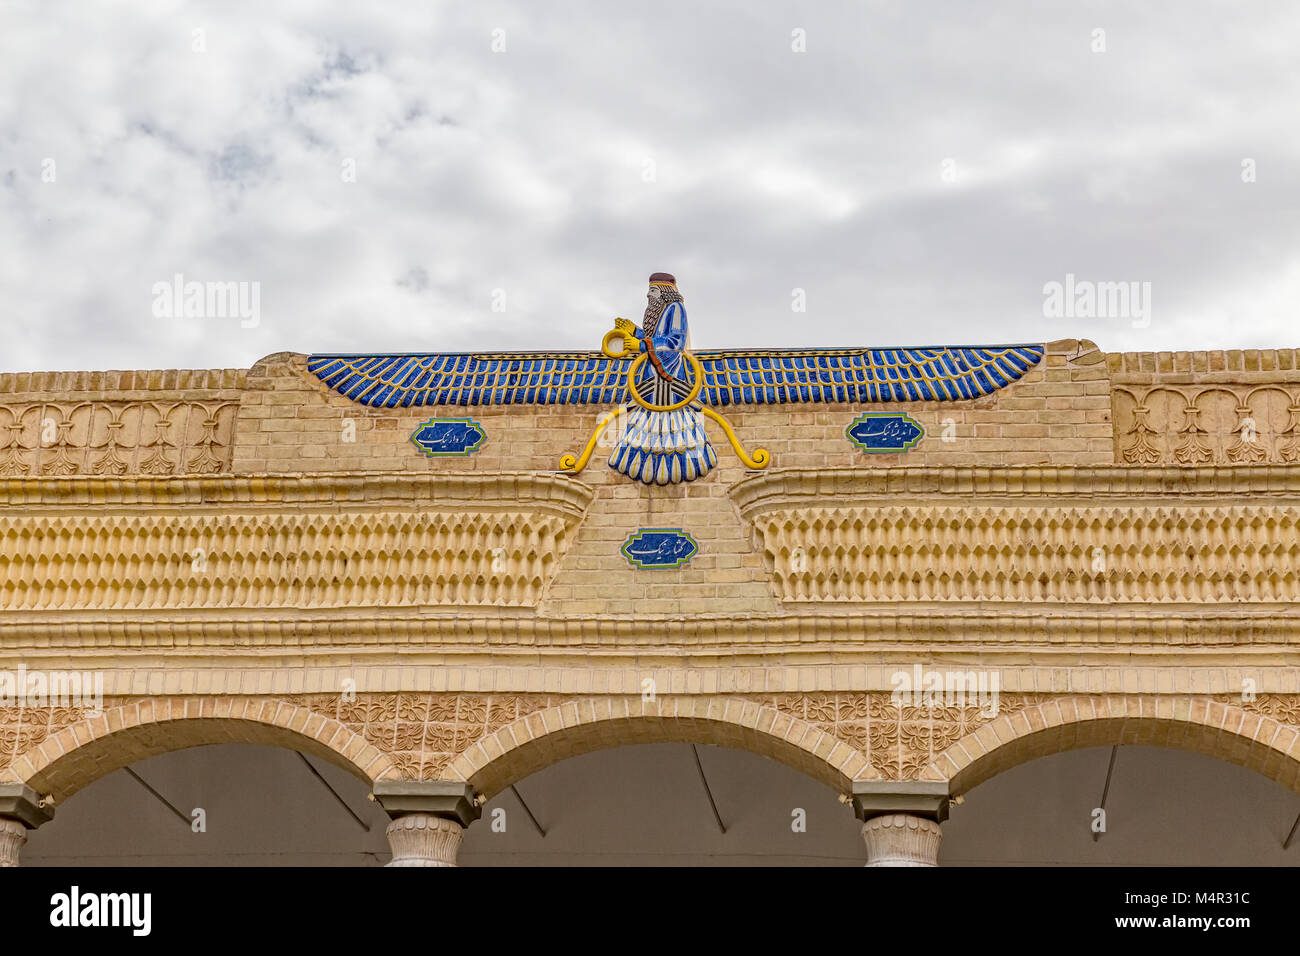 Faravahar on the Zoroastrian temple in Yazd - Stock Image